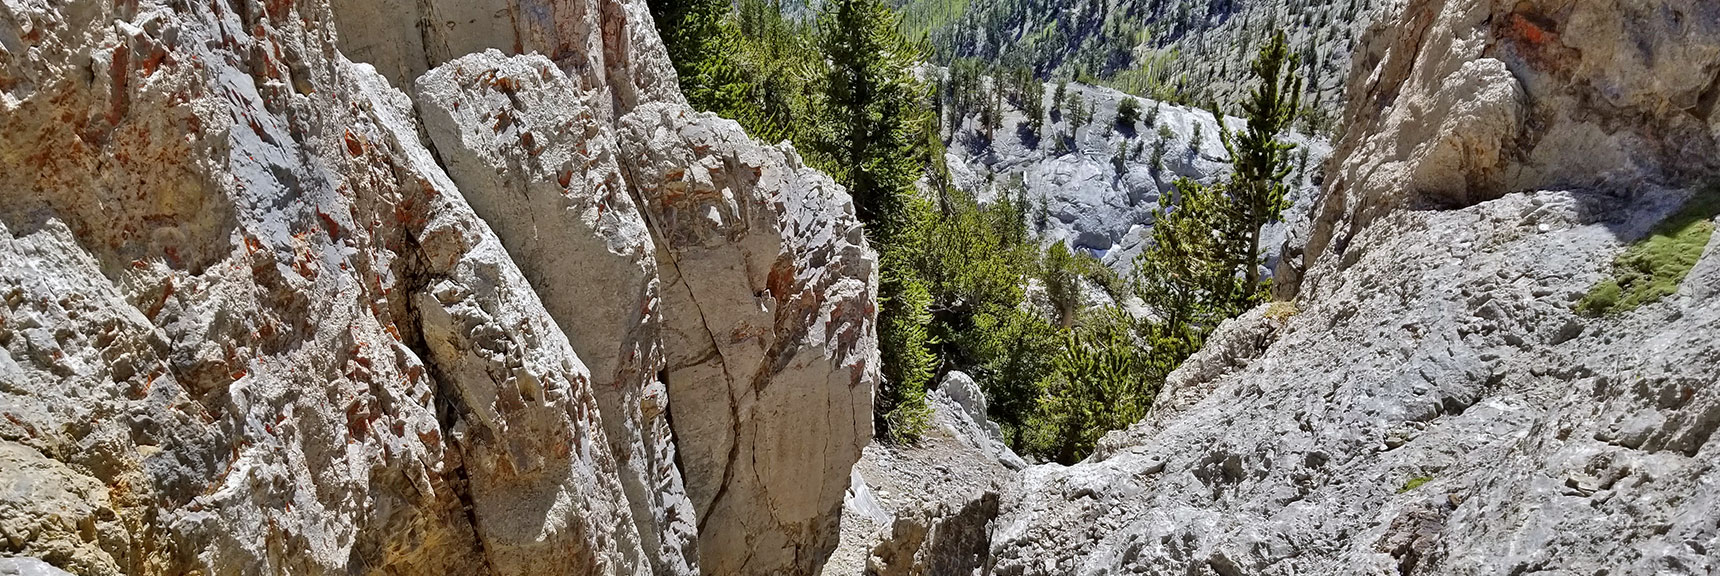 Return Down the Western Summit Approach Canyon   Mummy Mountain Nevada Northeast Approach